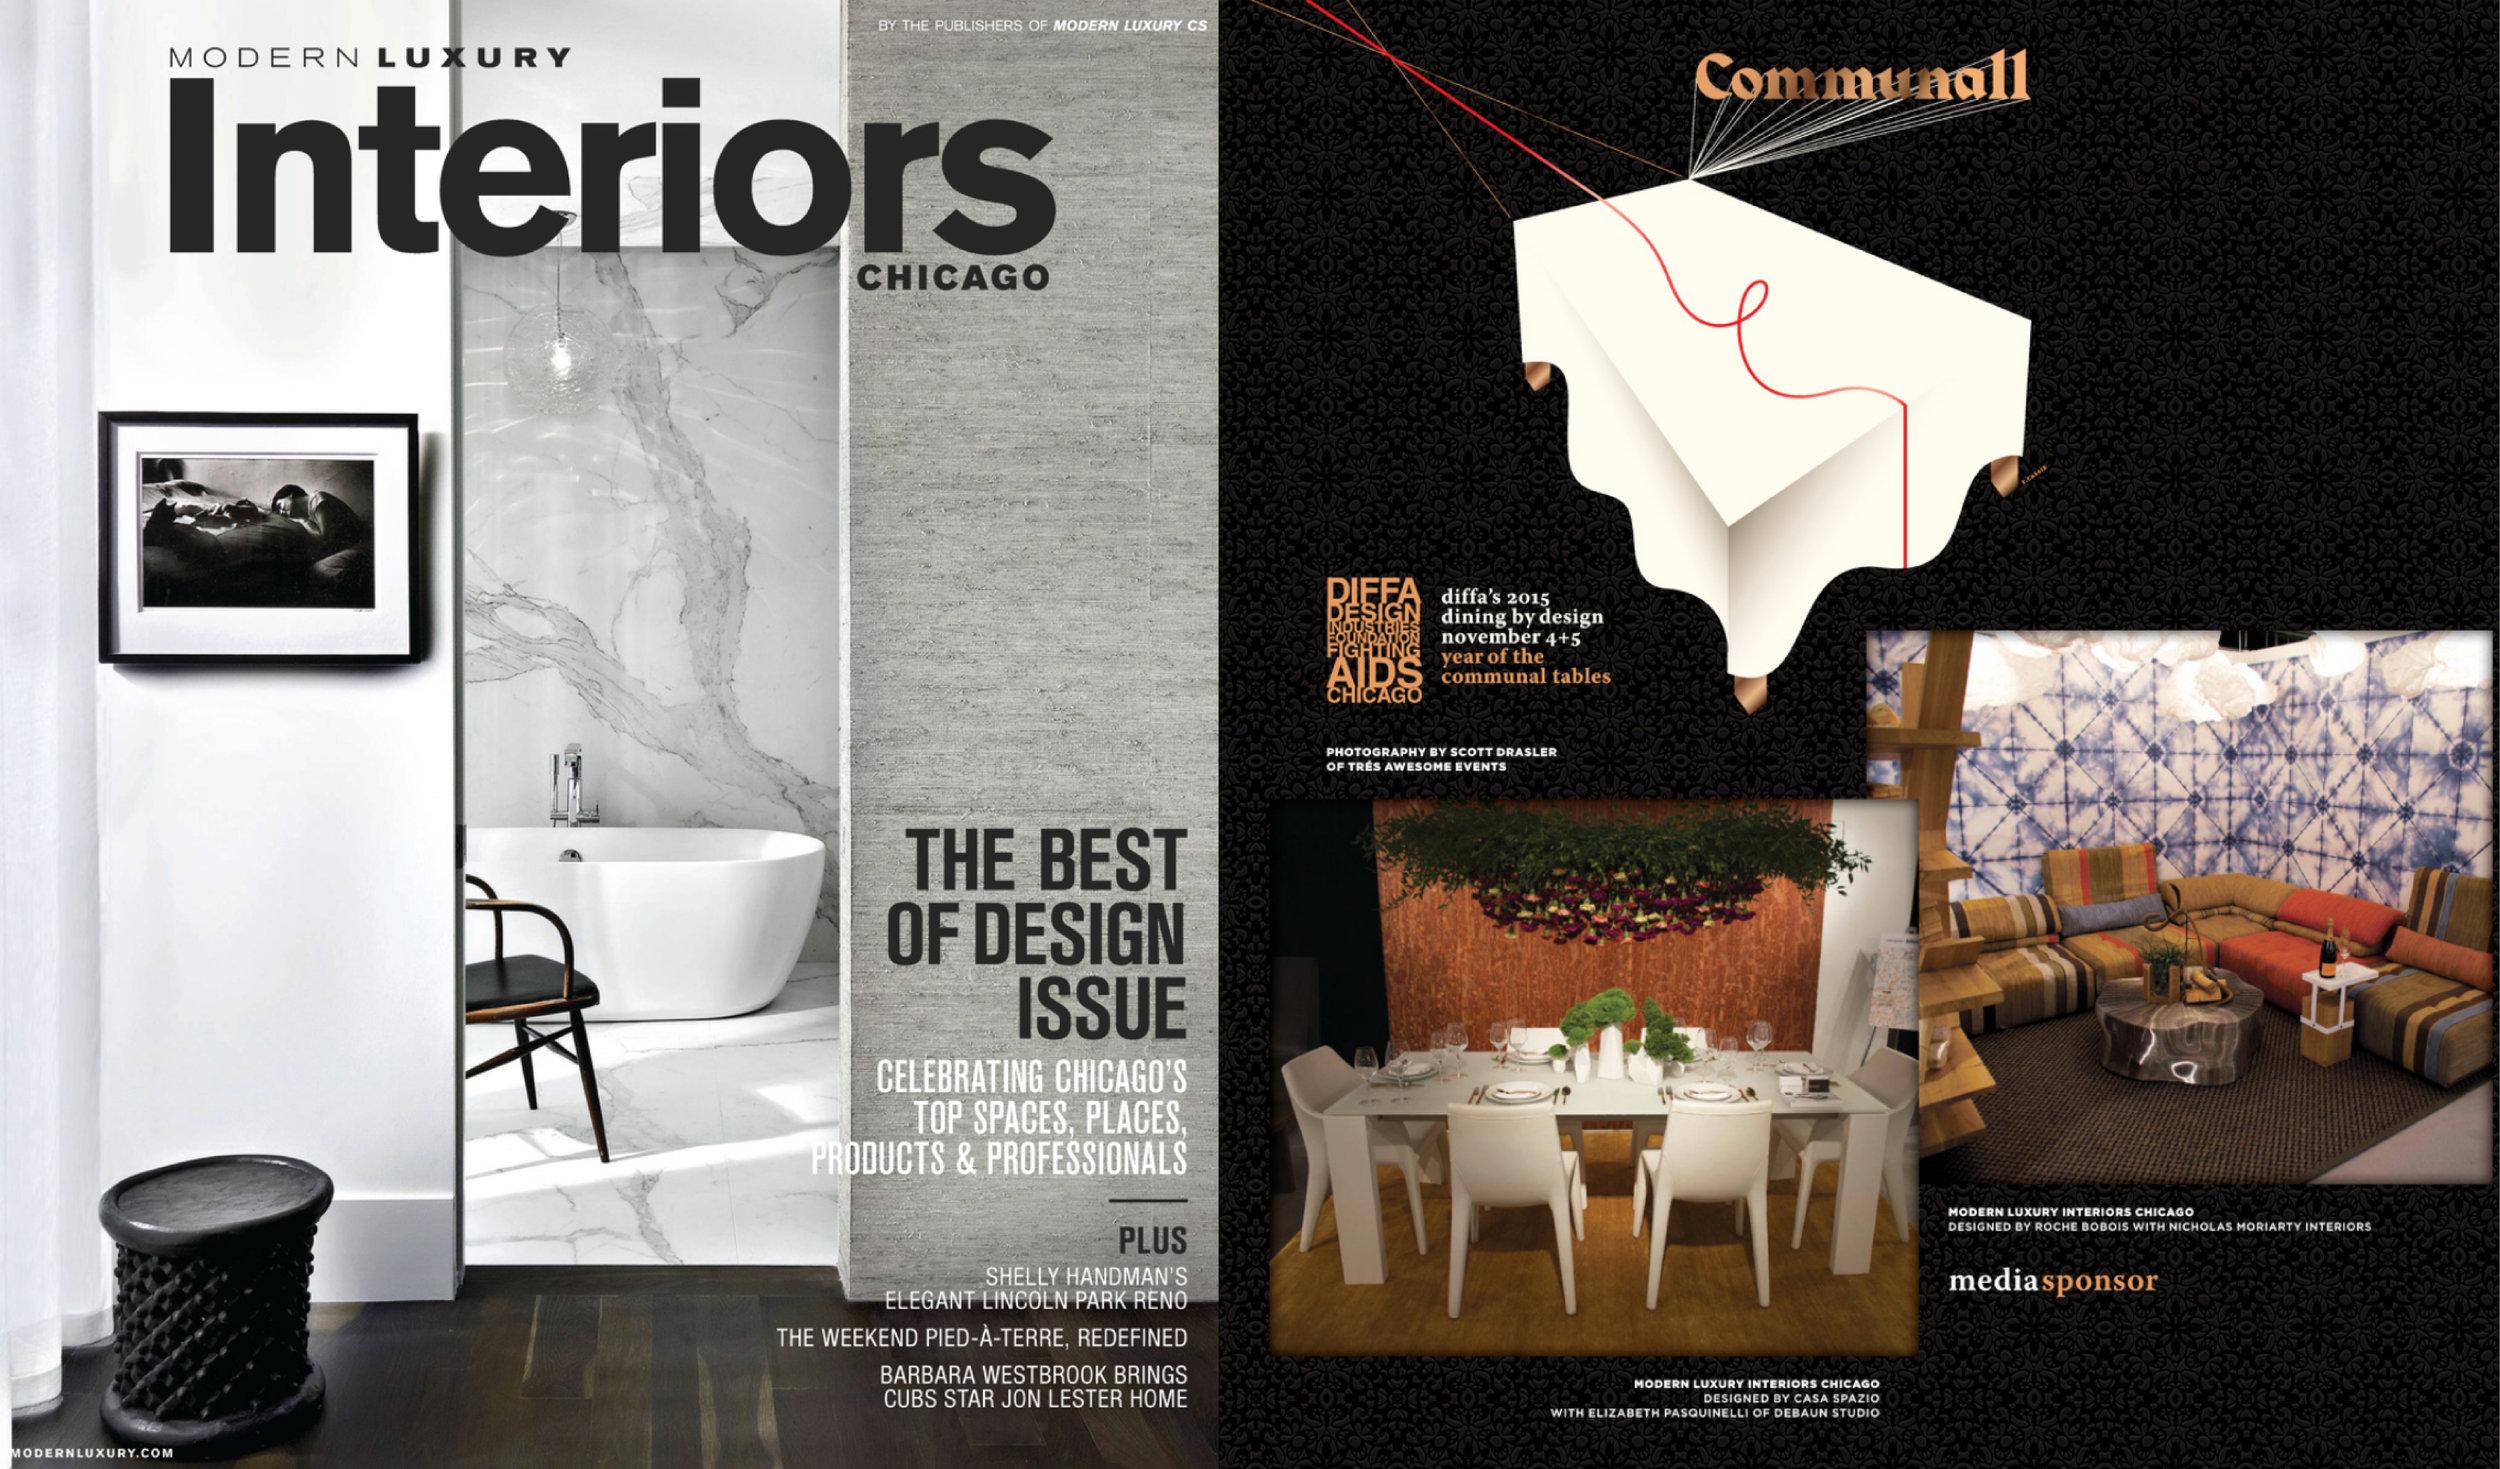 Modern Luxury Interiors January 2016 Issue.jpg